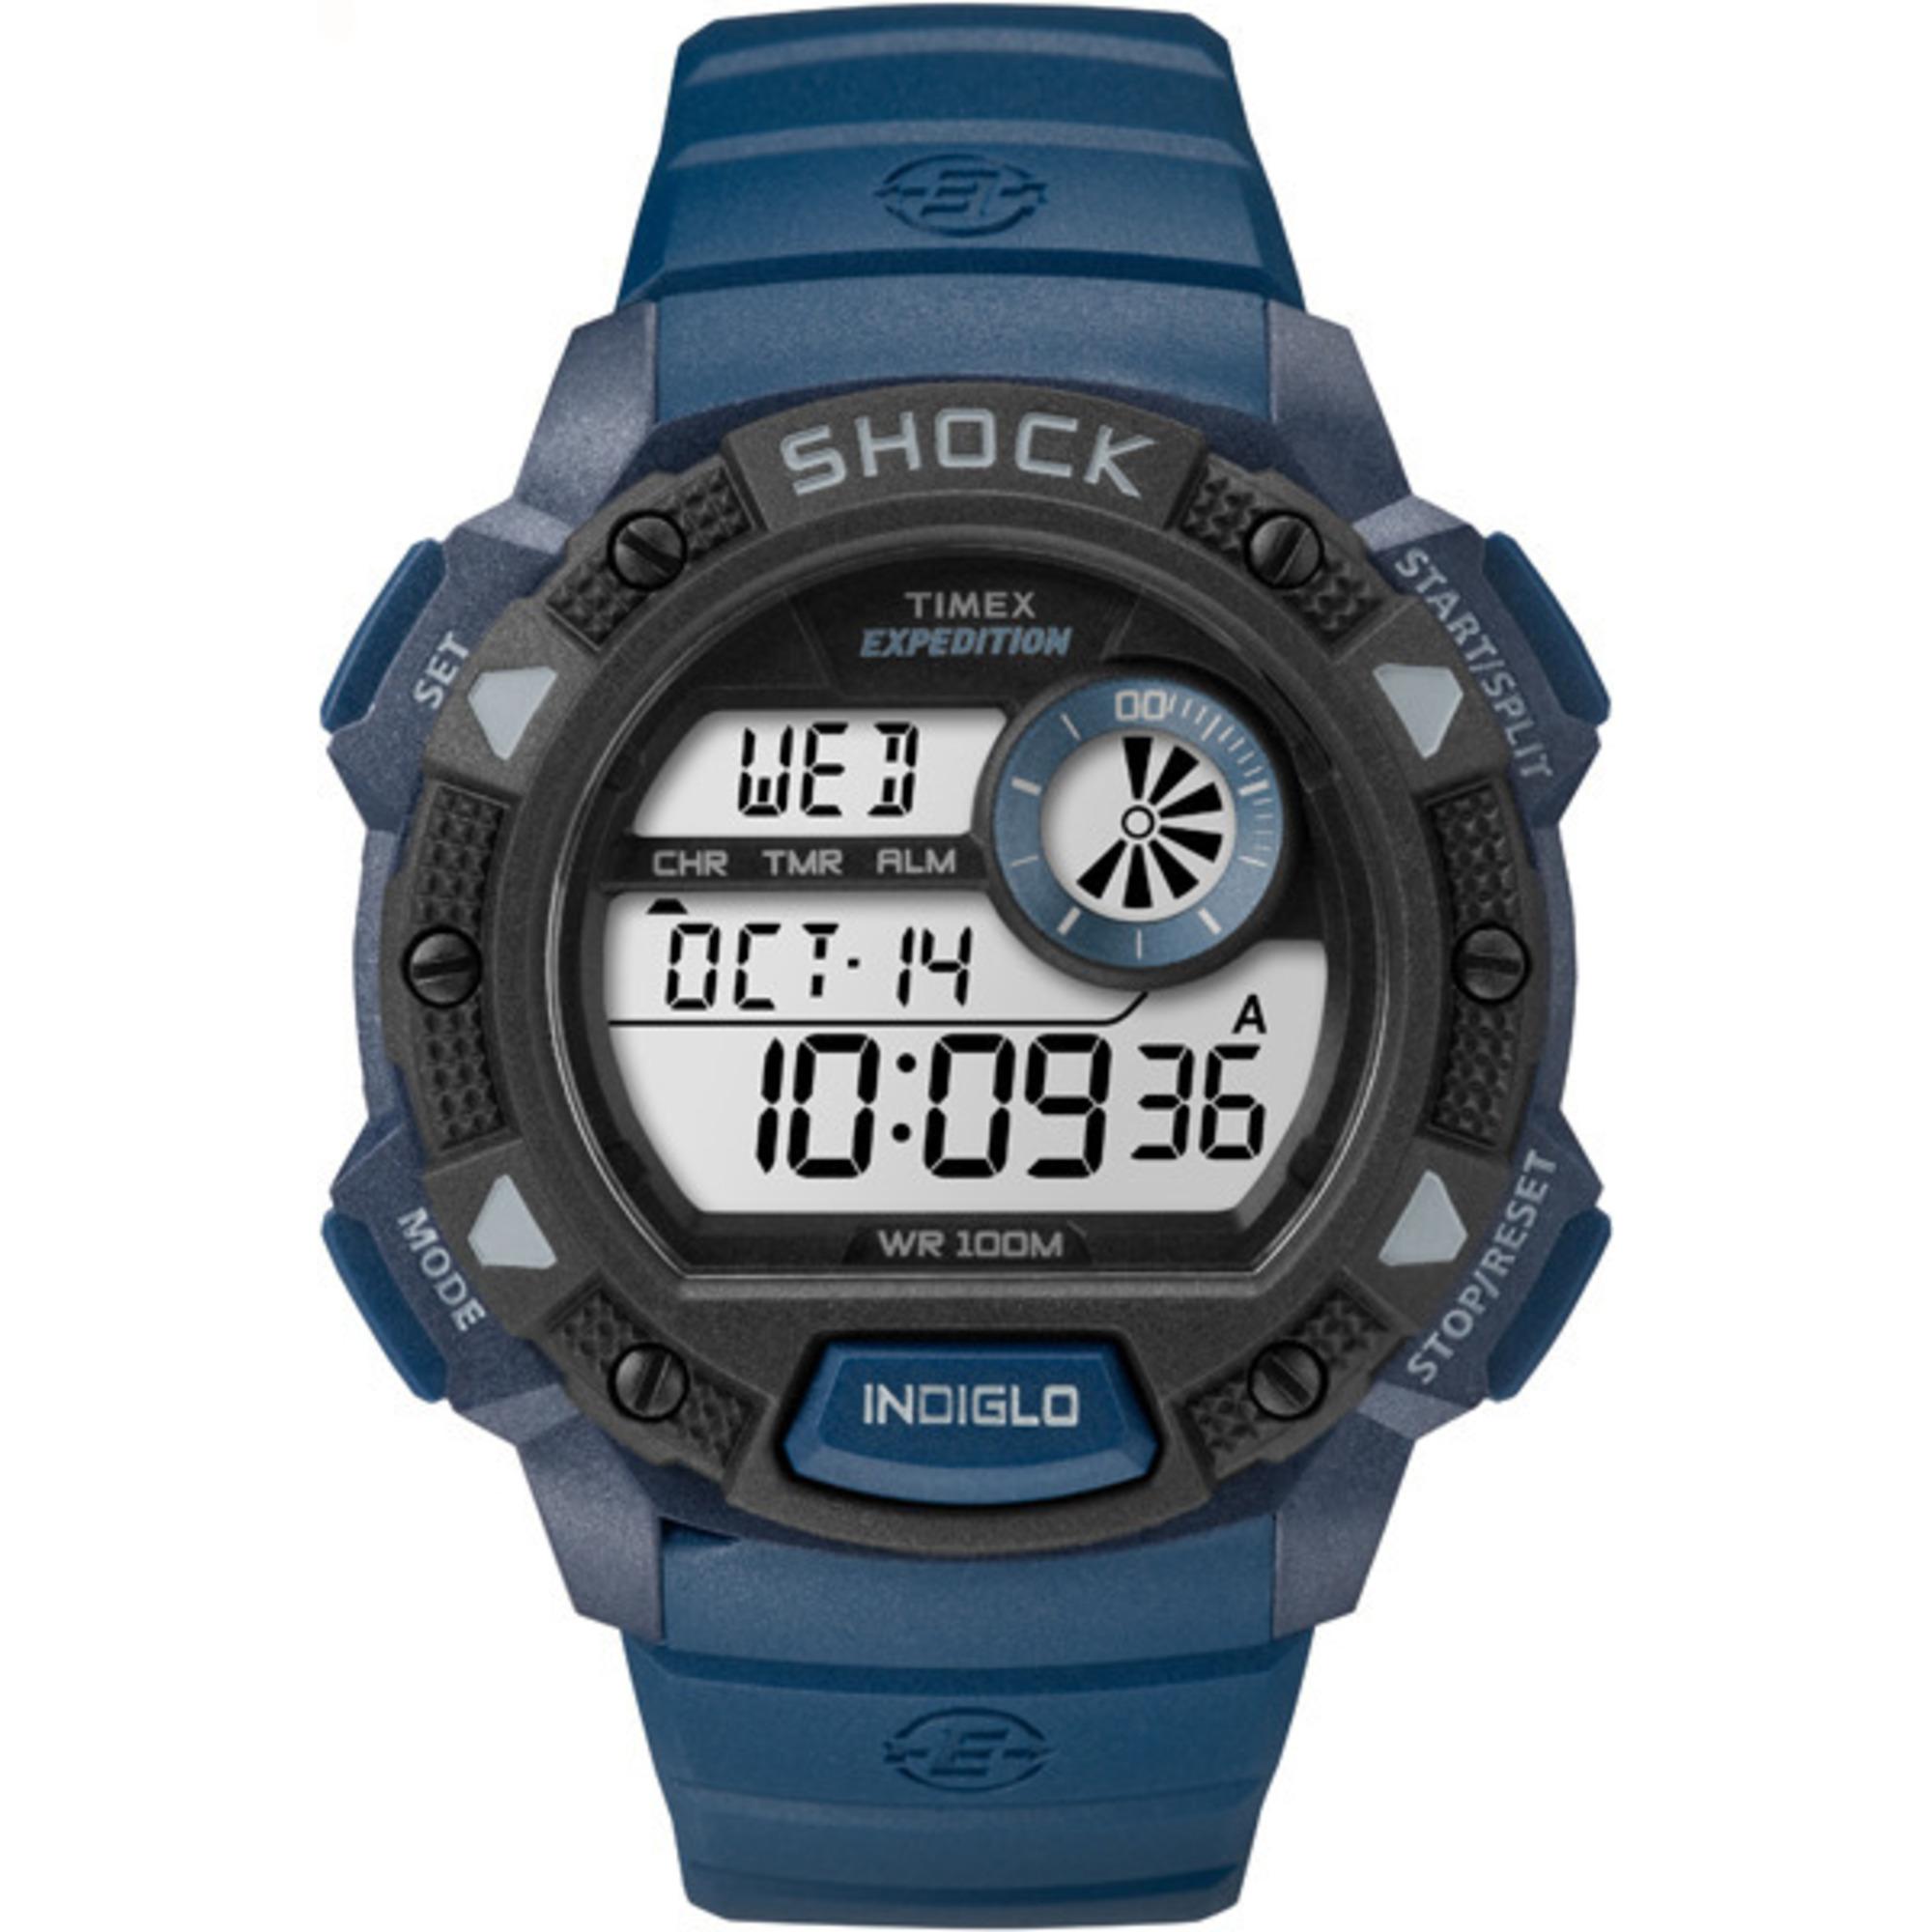 Timex Men's Expedition Base Shock Blue Digital Chronograph W